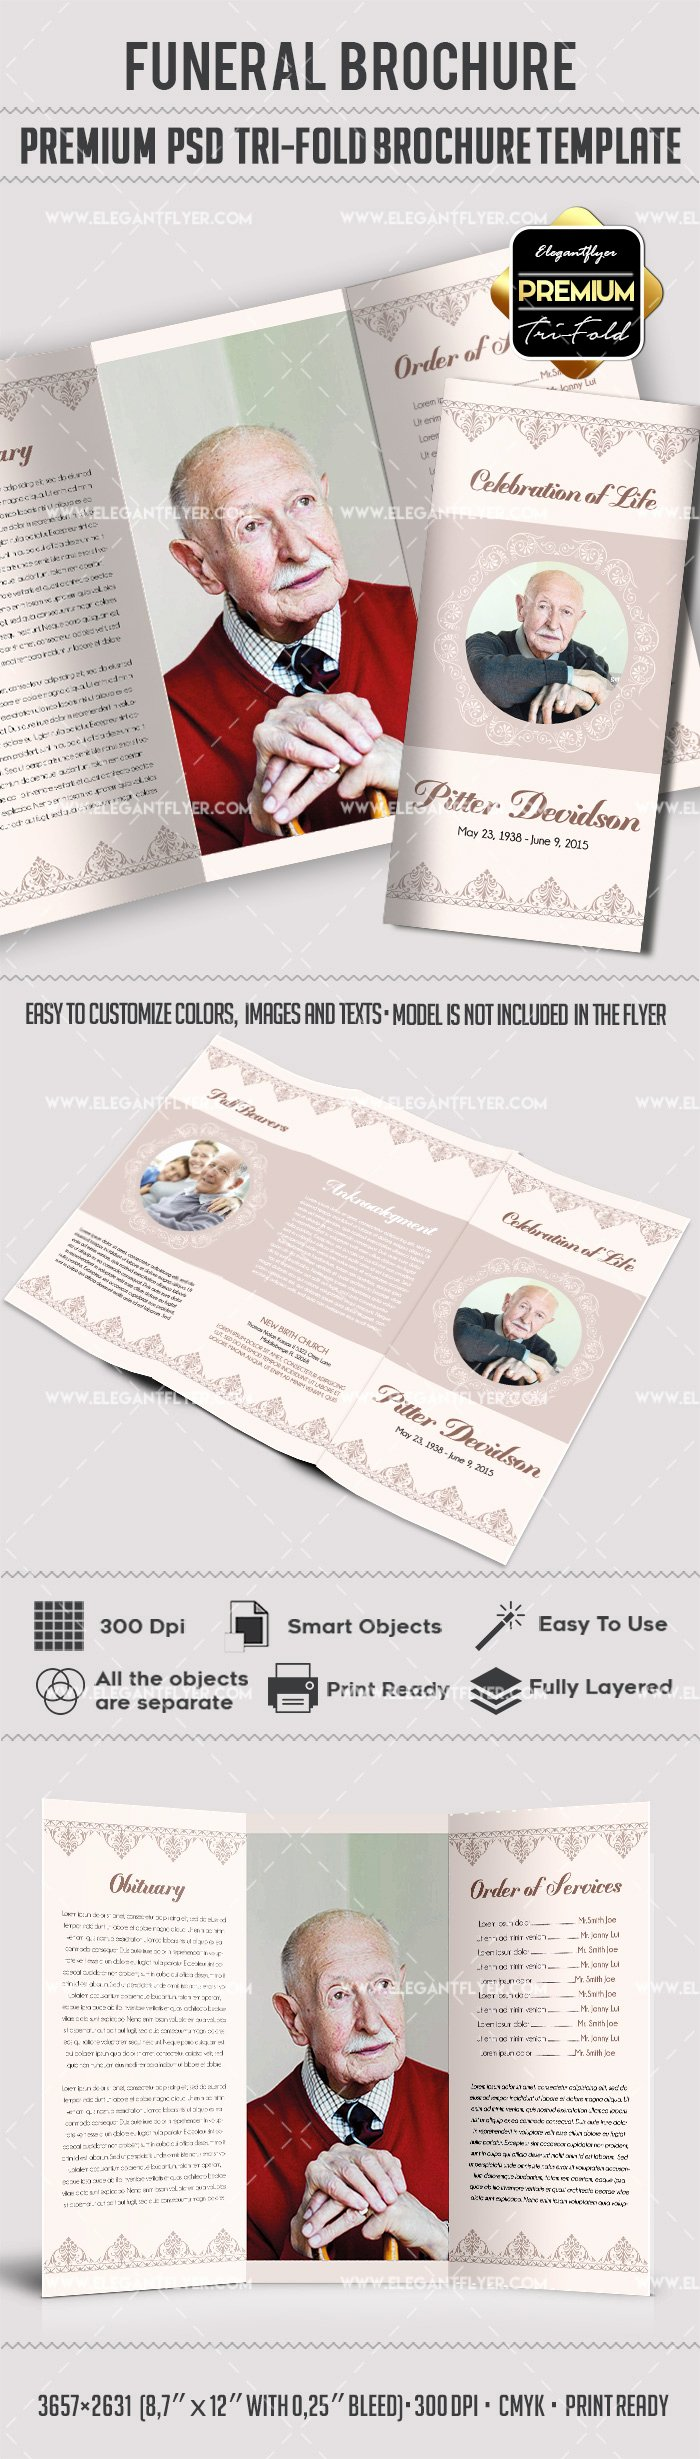 Tri Fold Funeral Service Brochure Template – by Elegantflyer